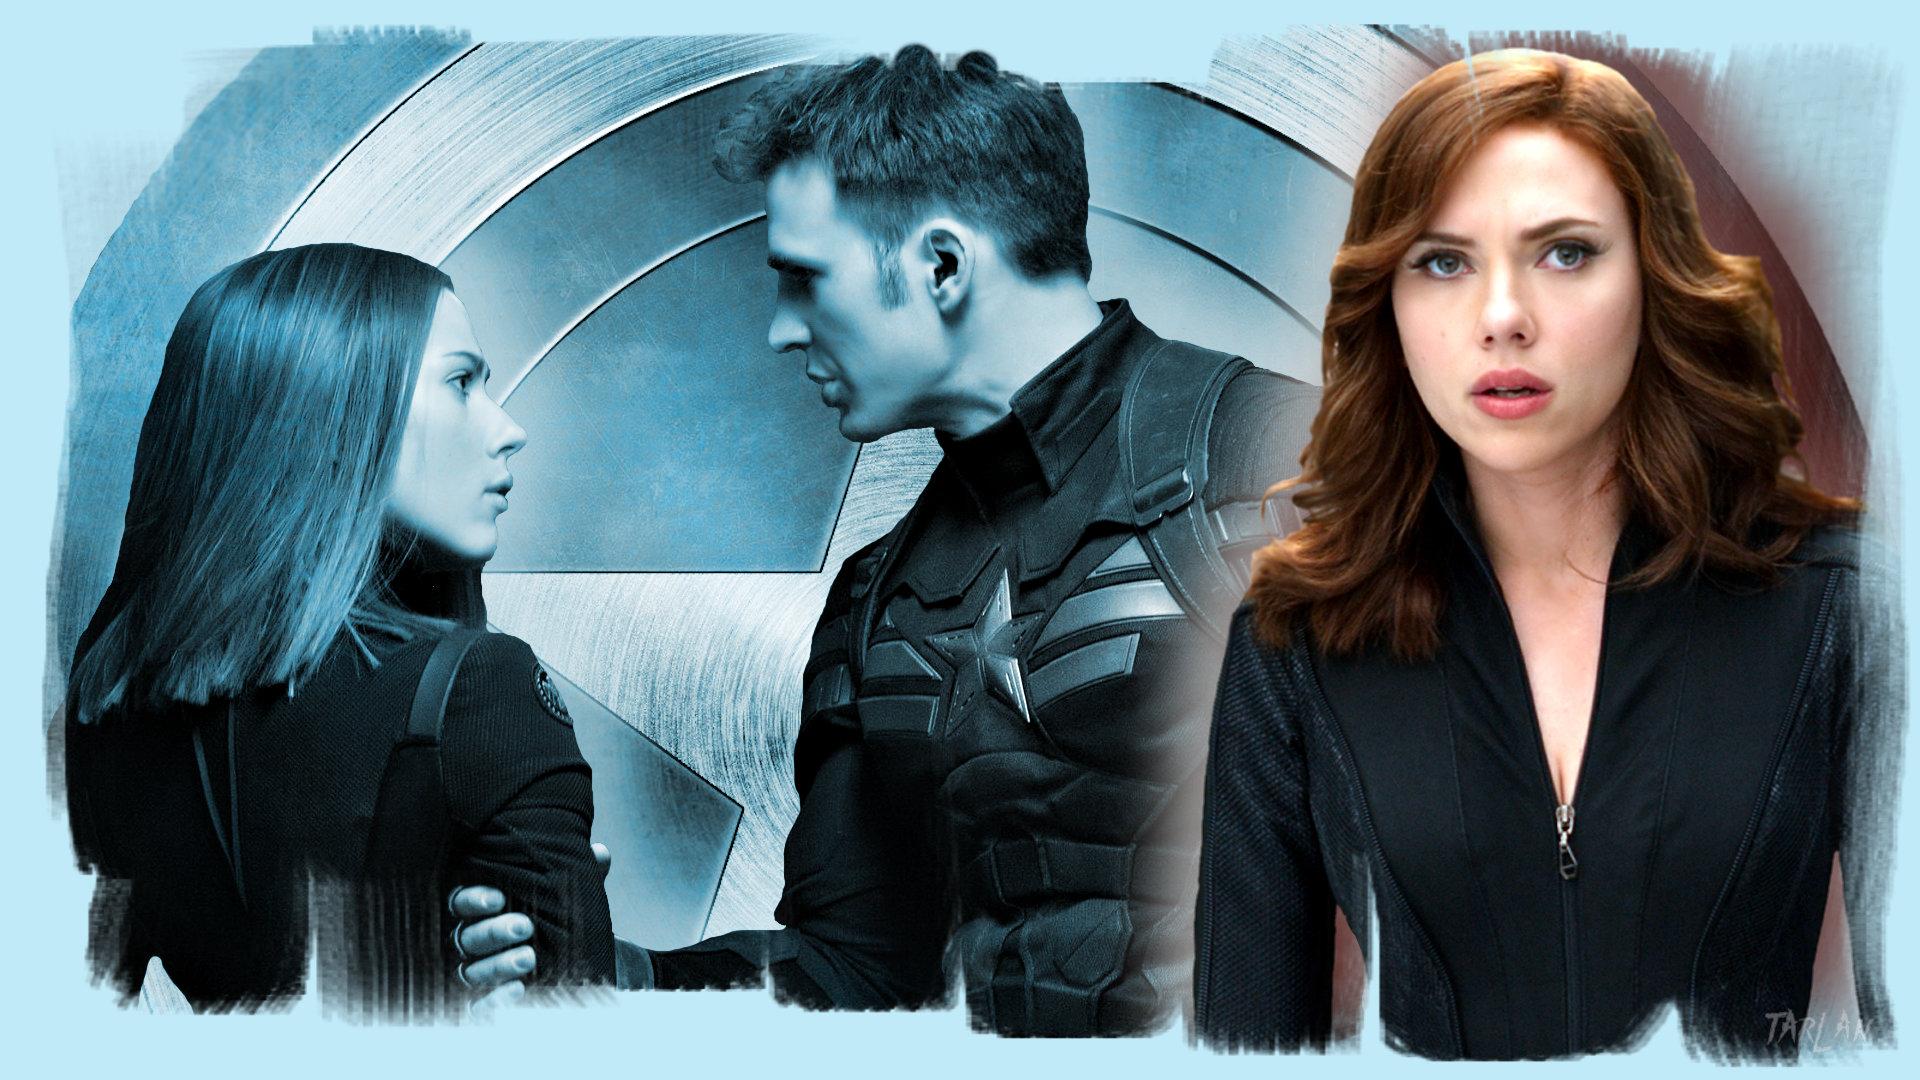 Avengers - Steve_Natasha 02 by tarlan